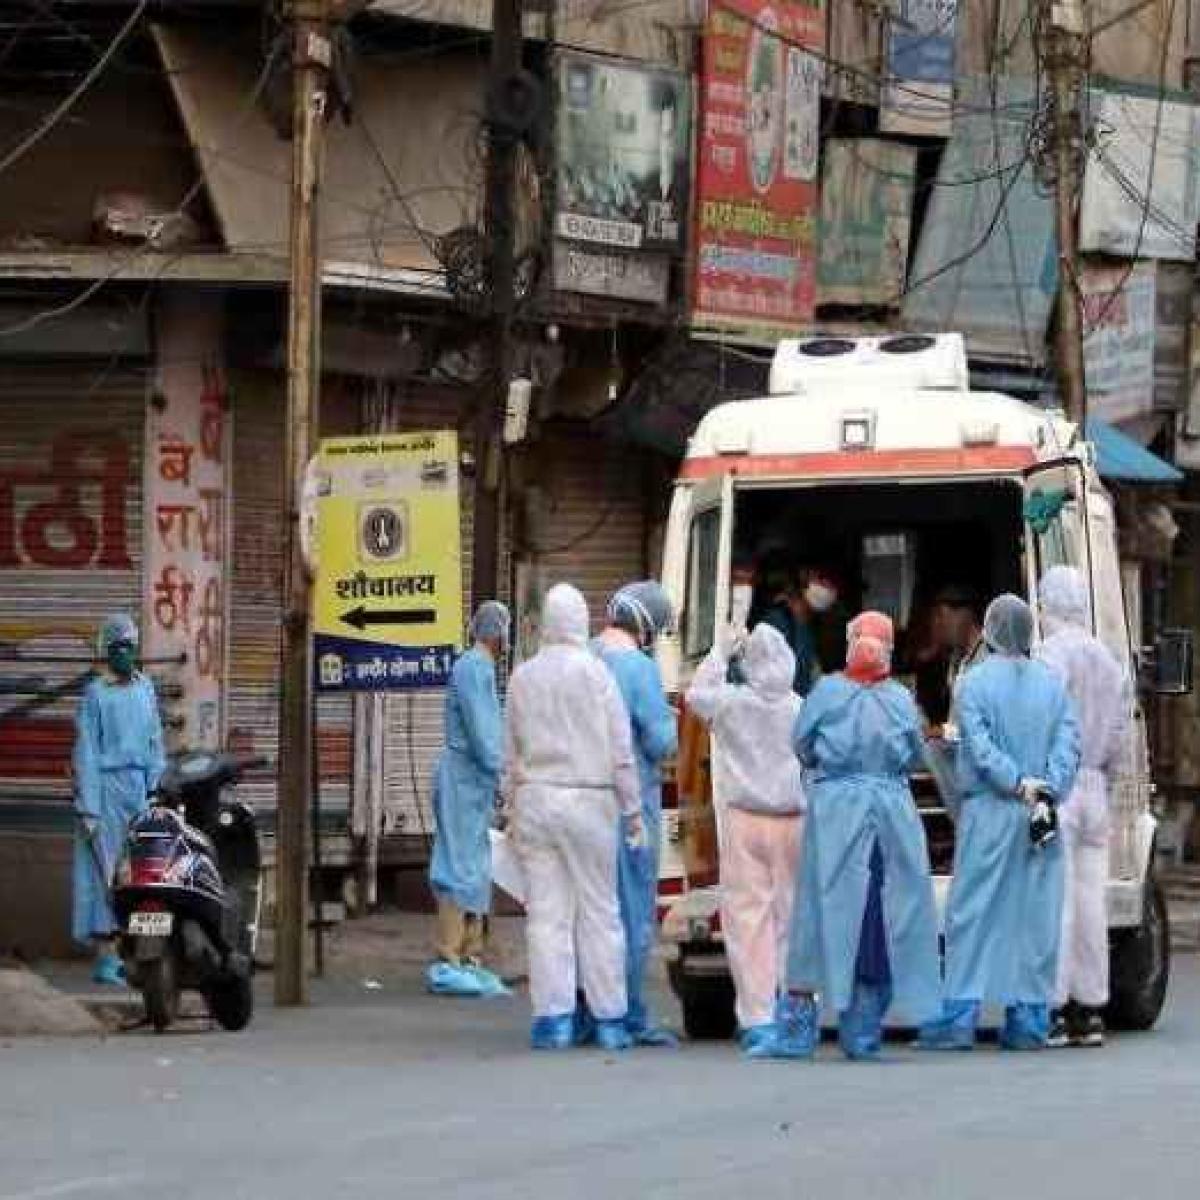 Indore Coronavirus Analysis: It's everywhere; Ward 57 has highest, Ward 51 lowest number